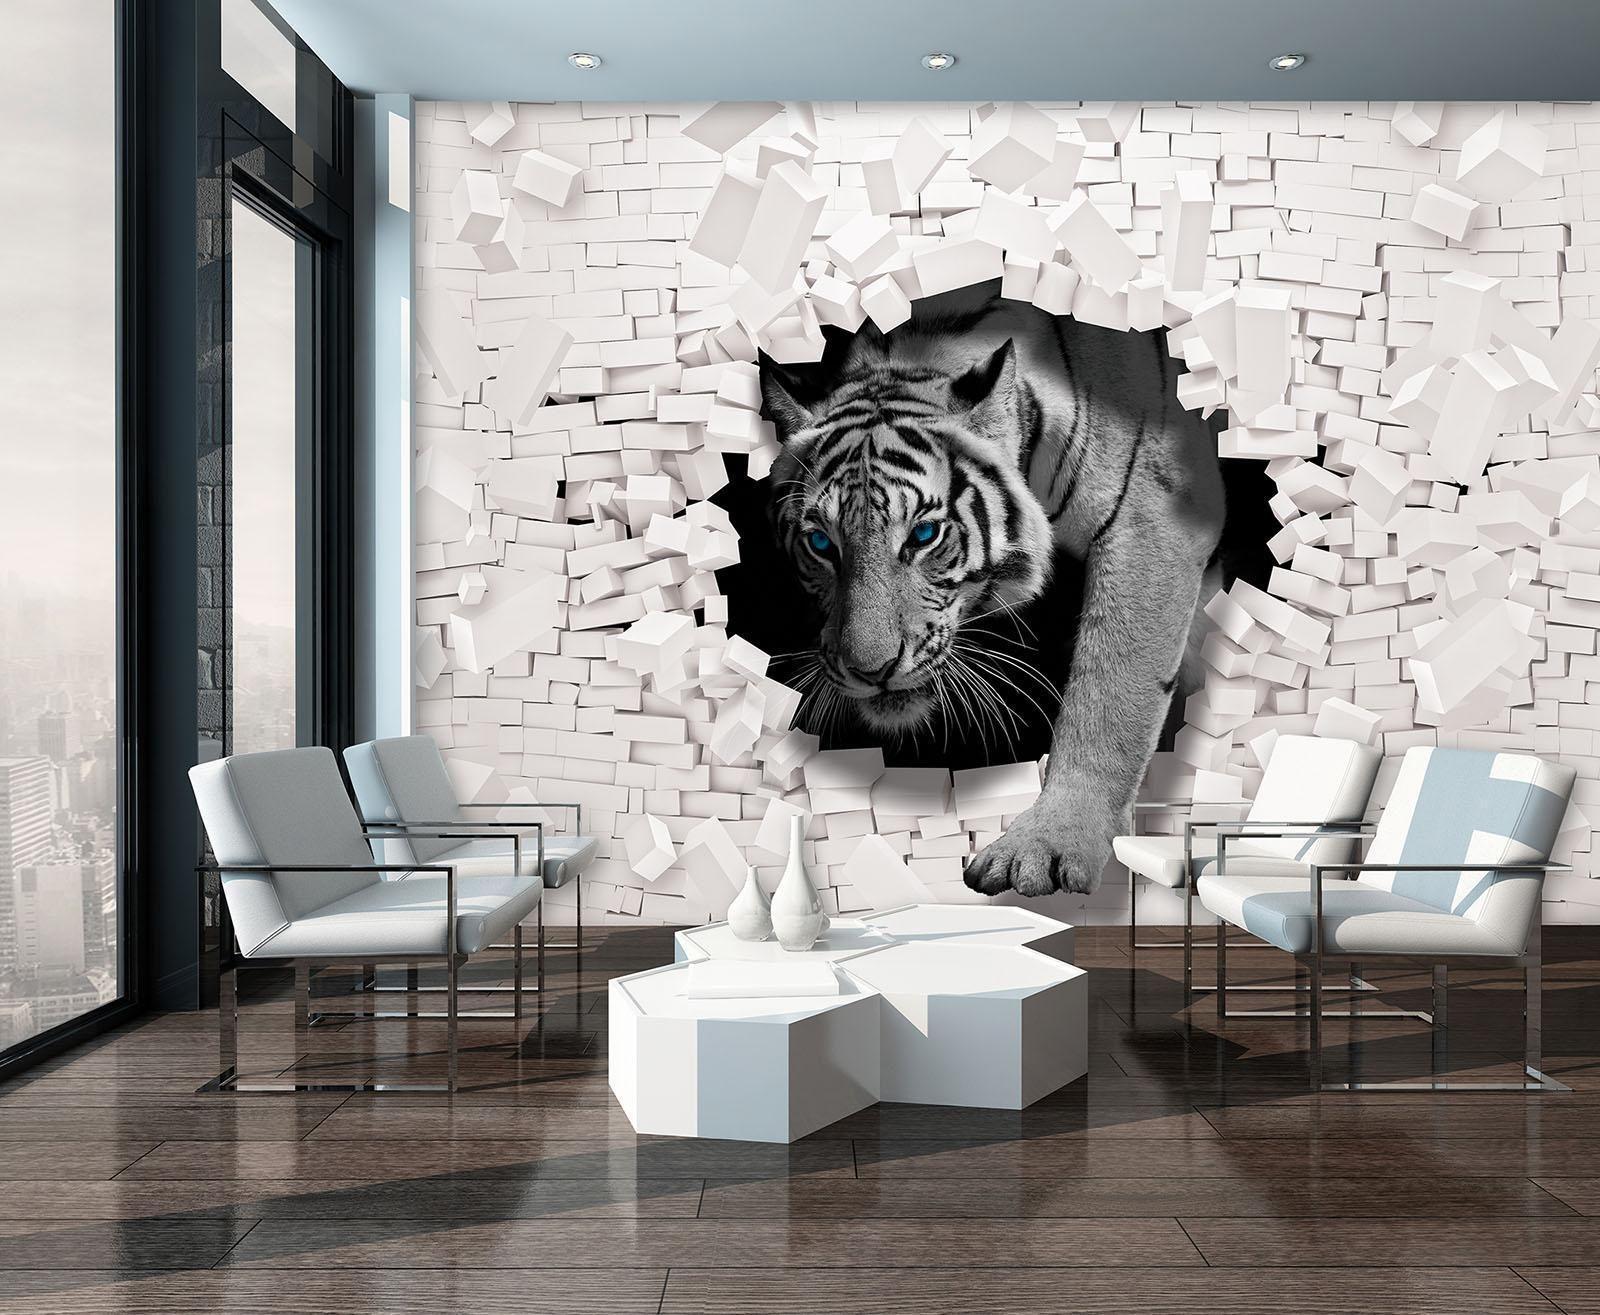 fototapete tapete wandbild vlies 1 10400 ve photo wallpaper mural 3d tiger kommt home decor. Black Bedroom Furniture Sets. Home Design Ideas